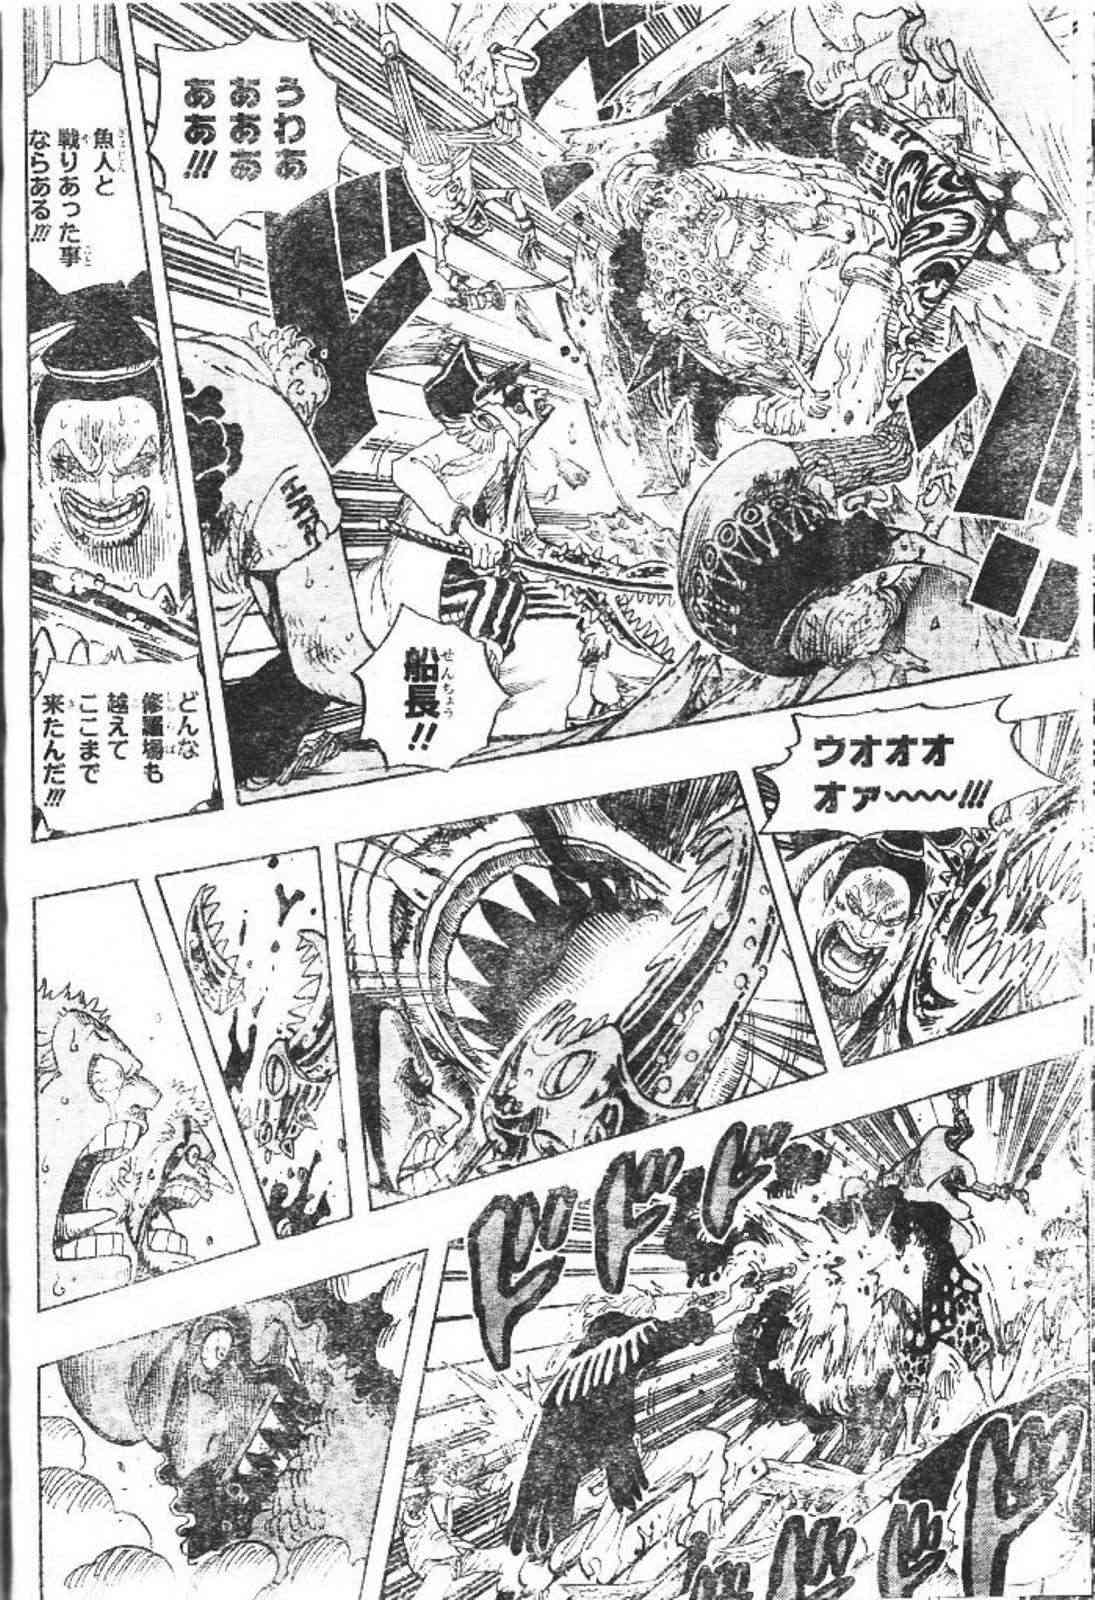 One Piece Manga 611 Spoiler Pics 14_raw10